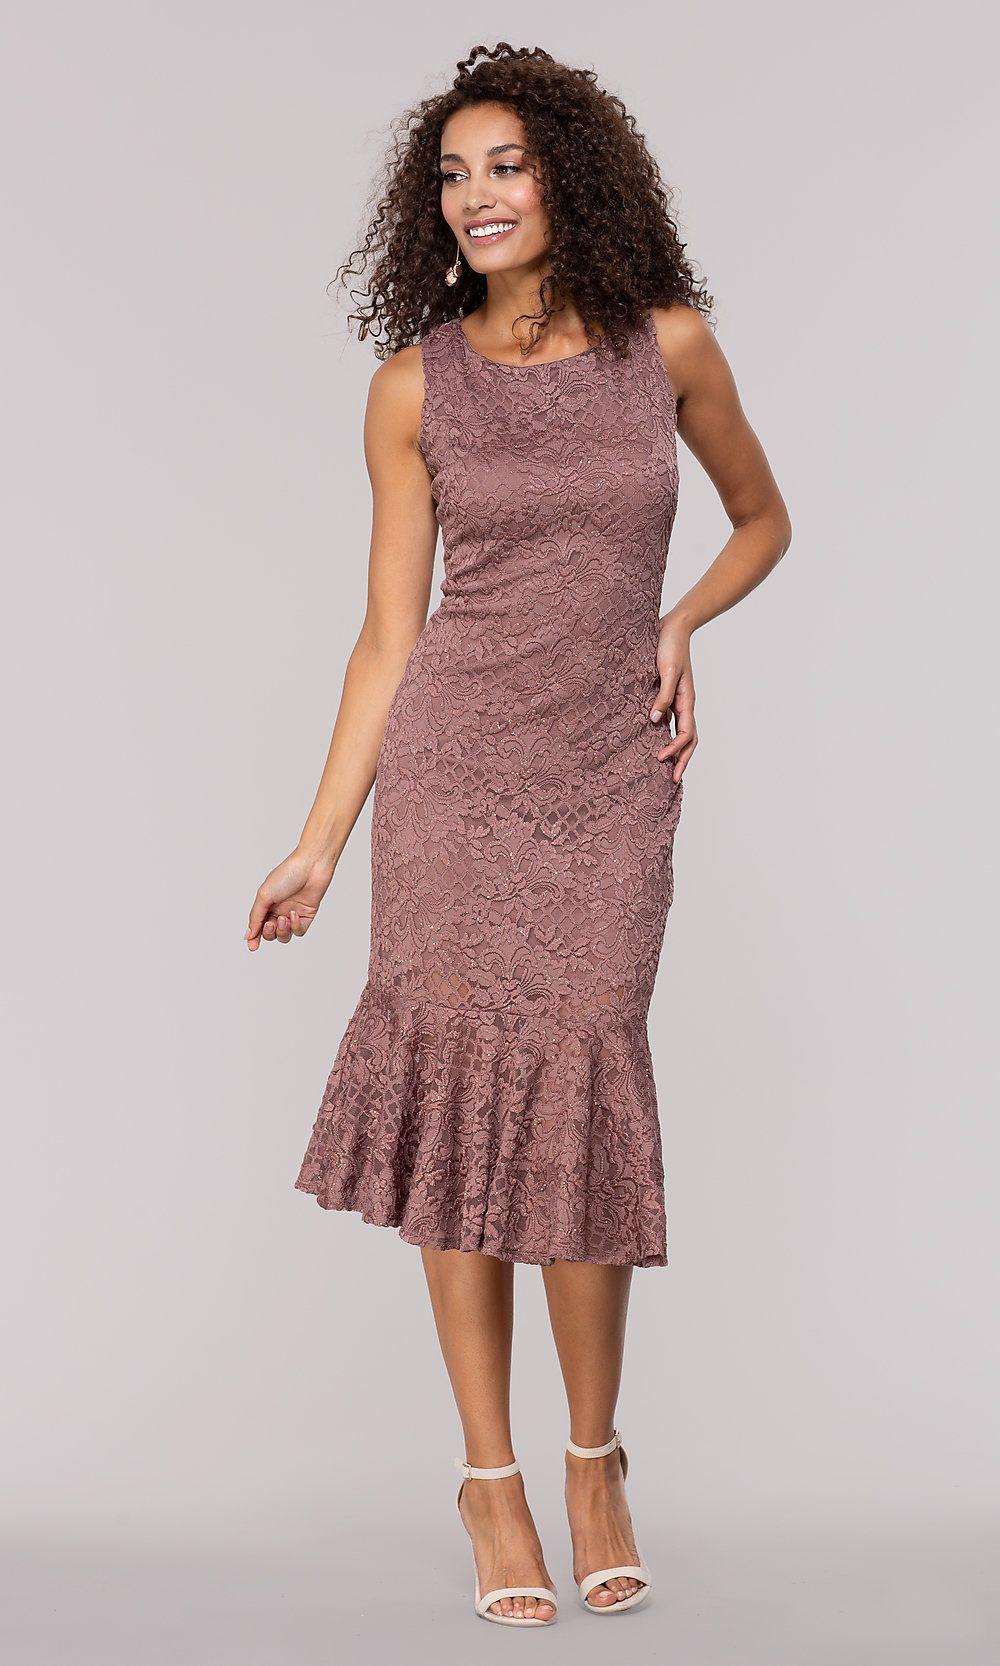 Knee Length Glitter Lace Wedding Guest Dress Wedding Guest Dress Dresses Beautiful Party Dresses [ 1666 x 1000 Pixel ]